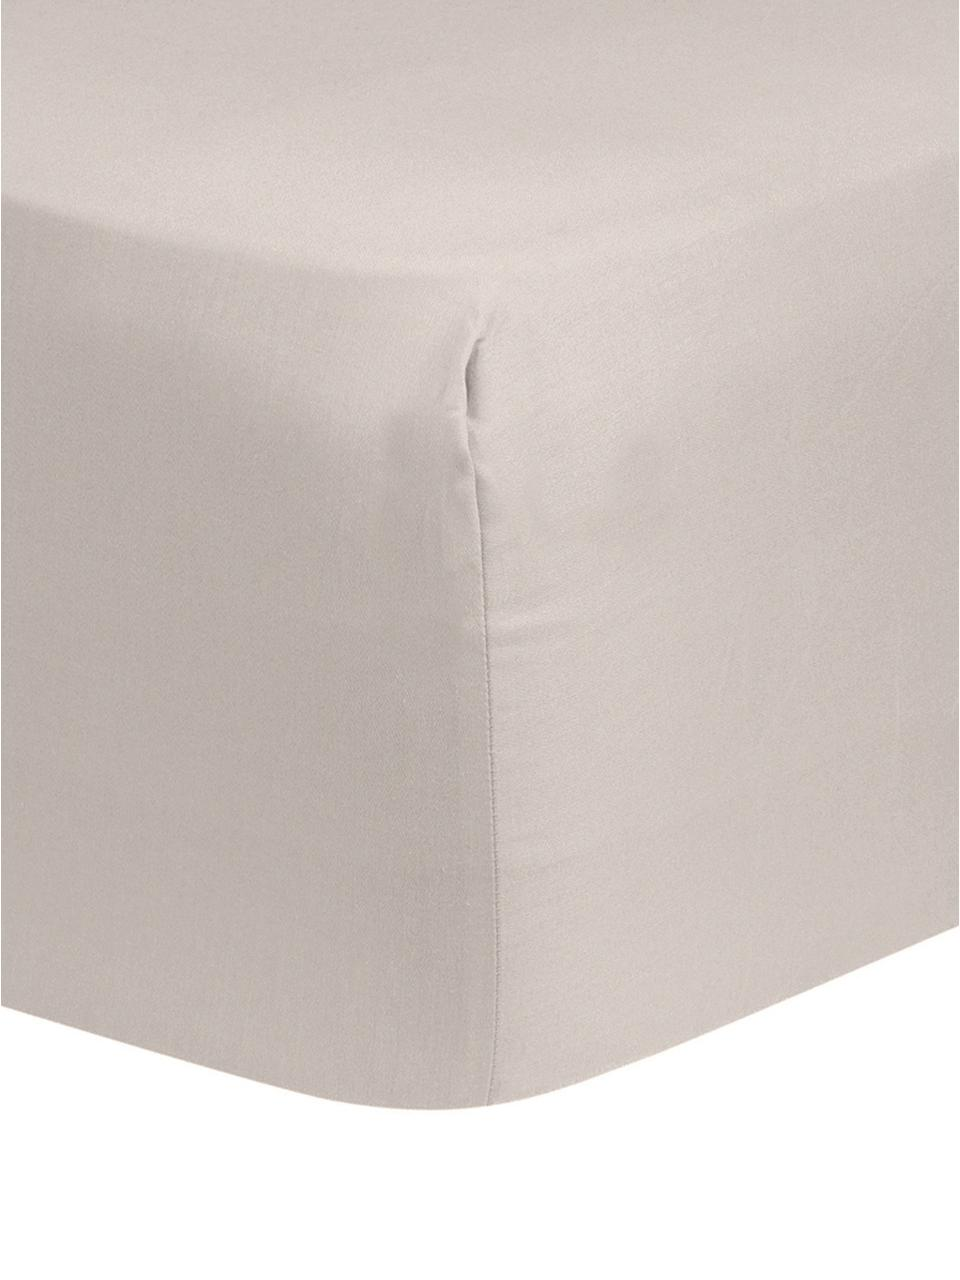 Sábana bajera para boxspring de algodón Comfort, Gris pardo, Cama 200 cm (200 x 200 cm)